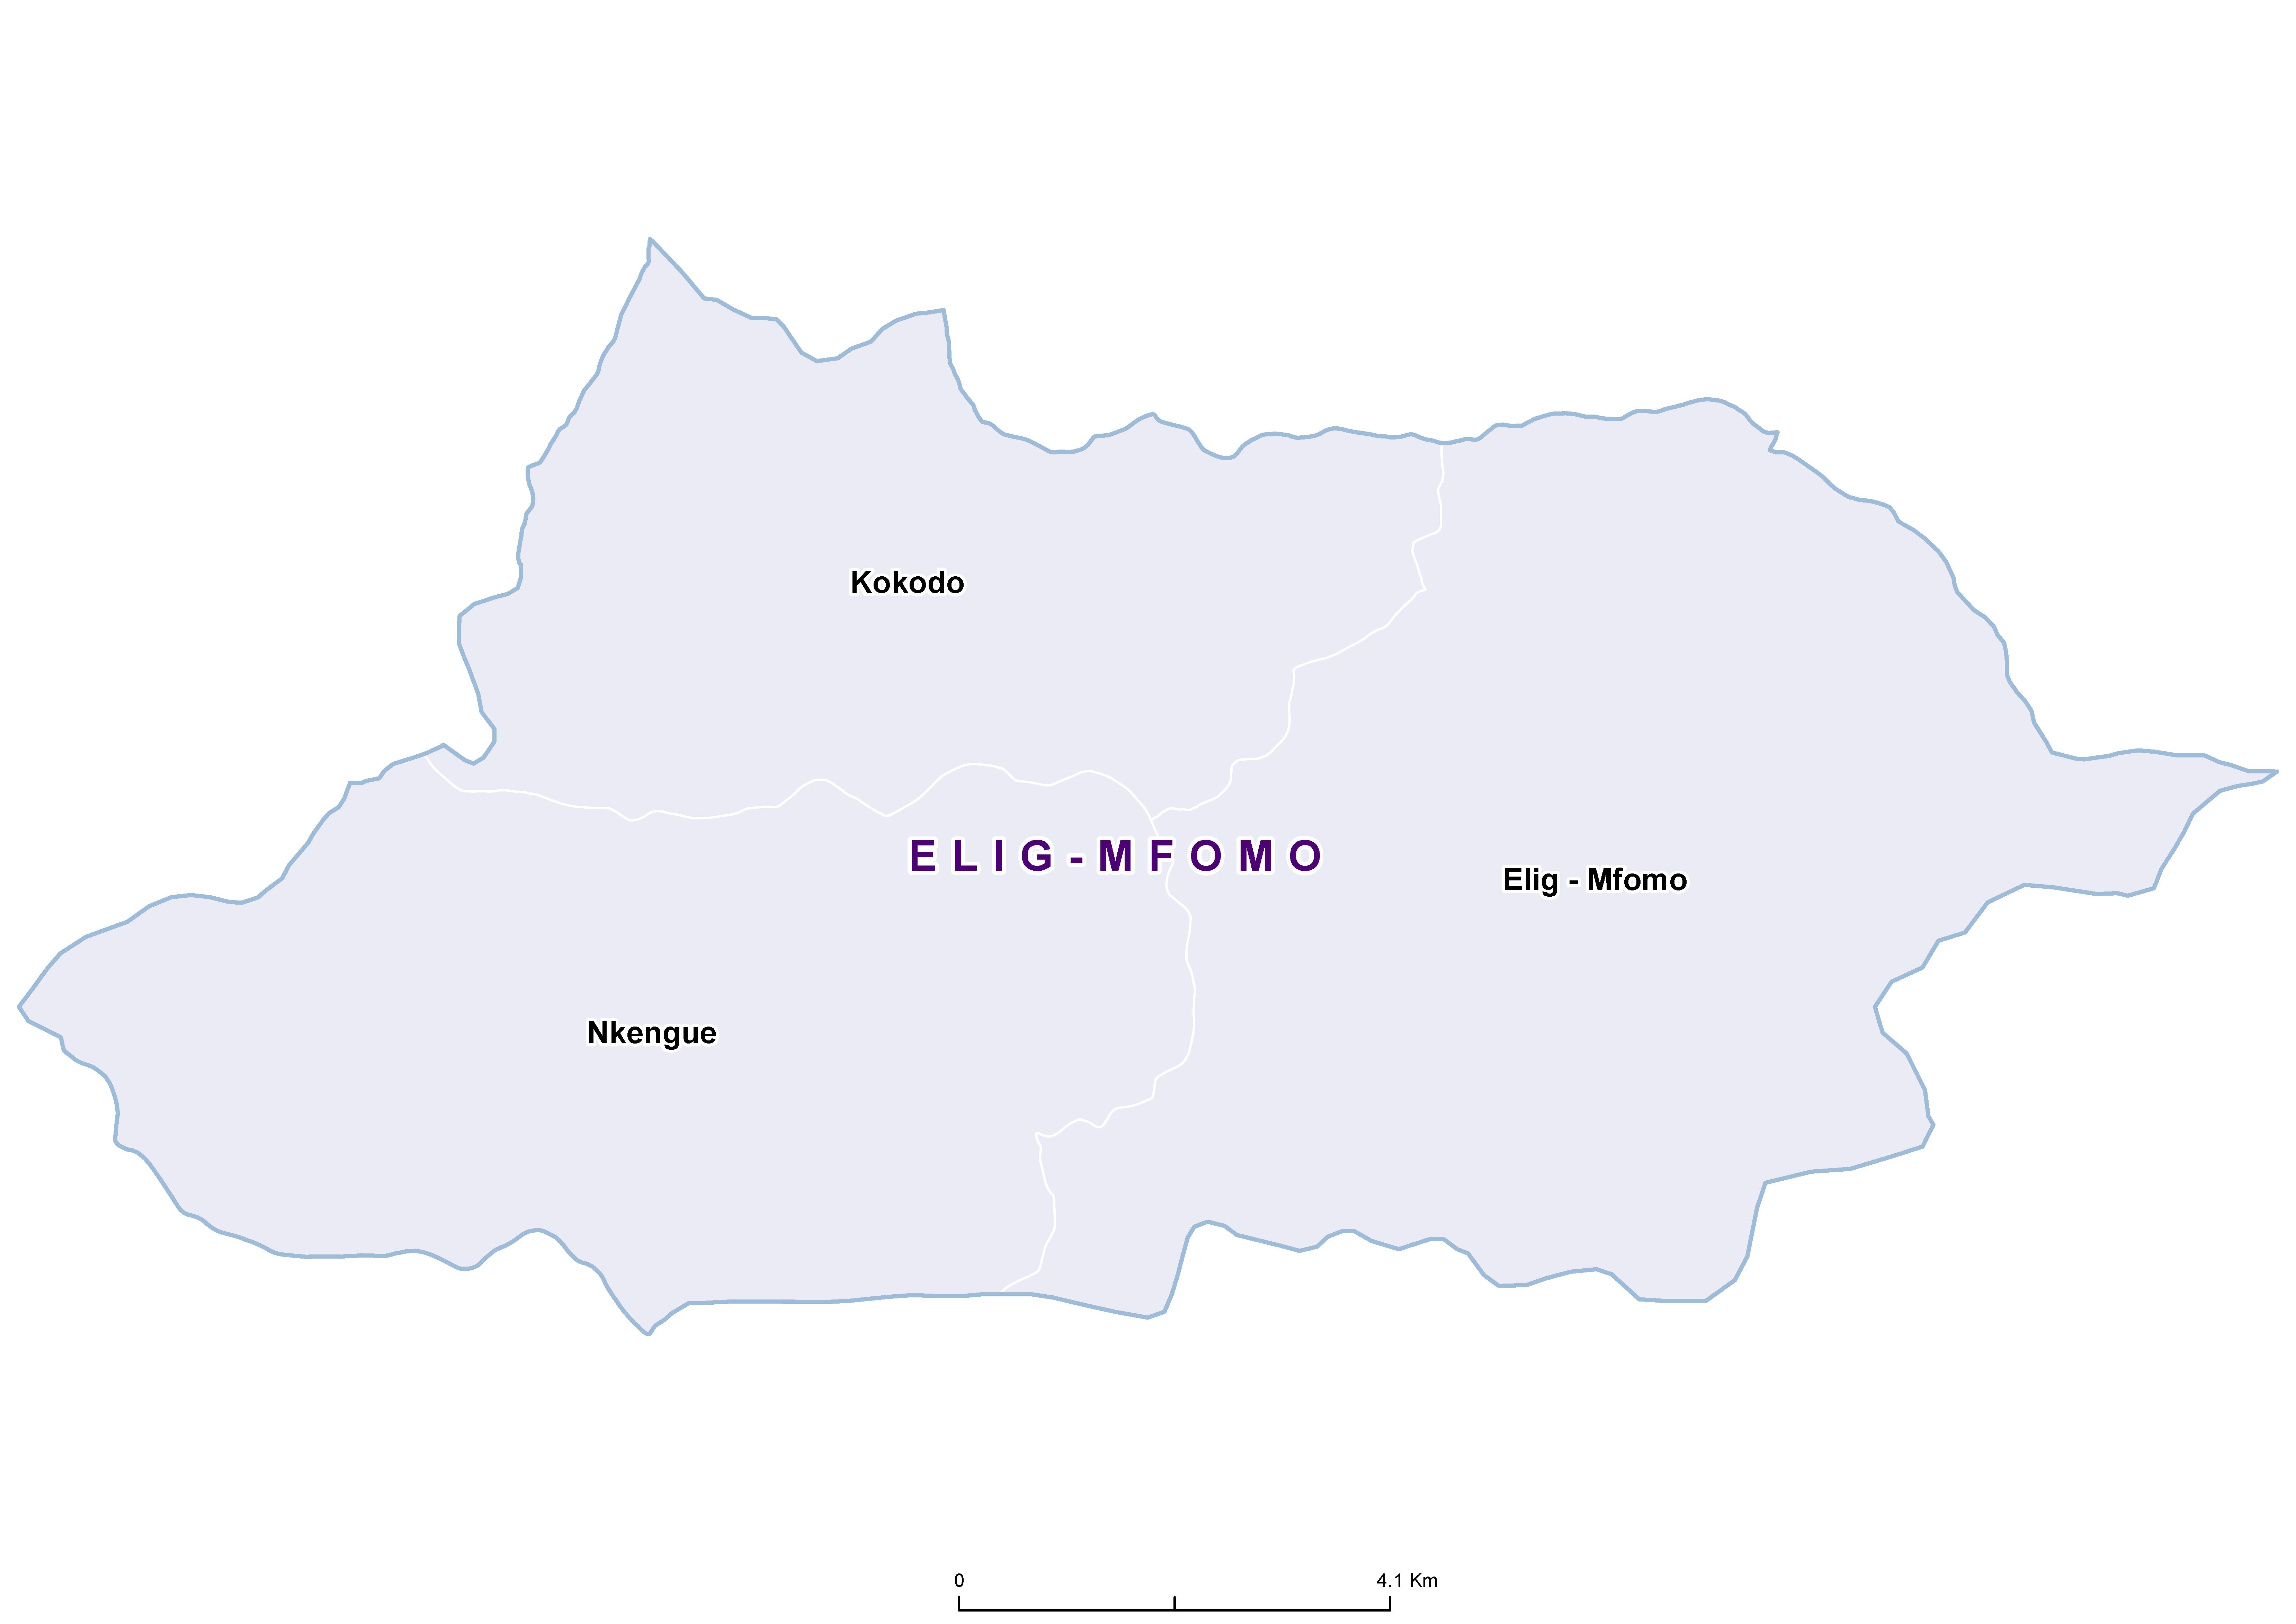 Elig-mfomo STH 19850001